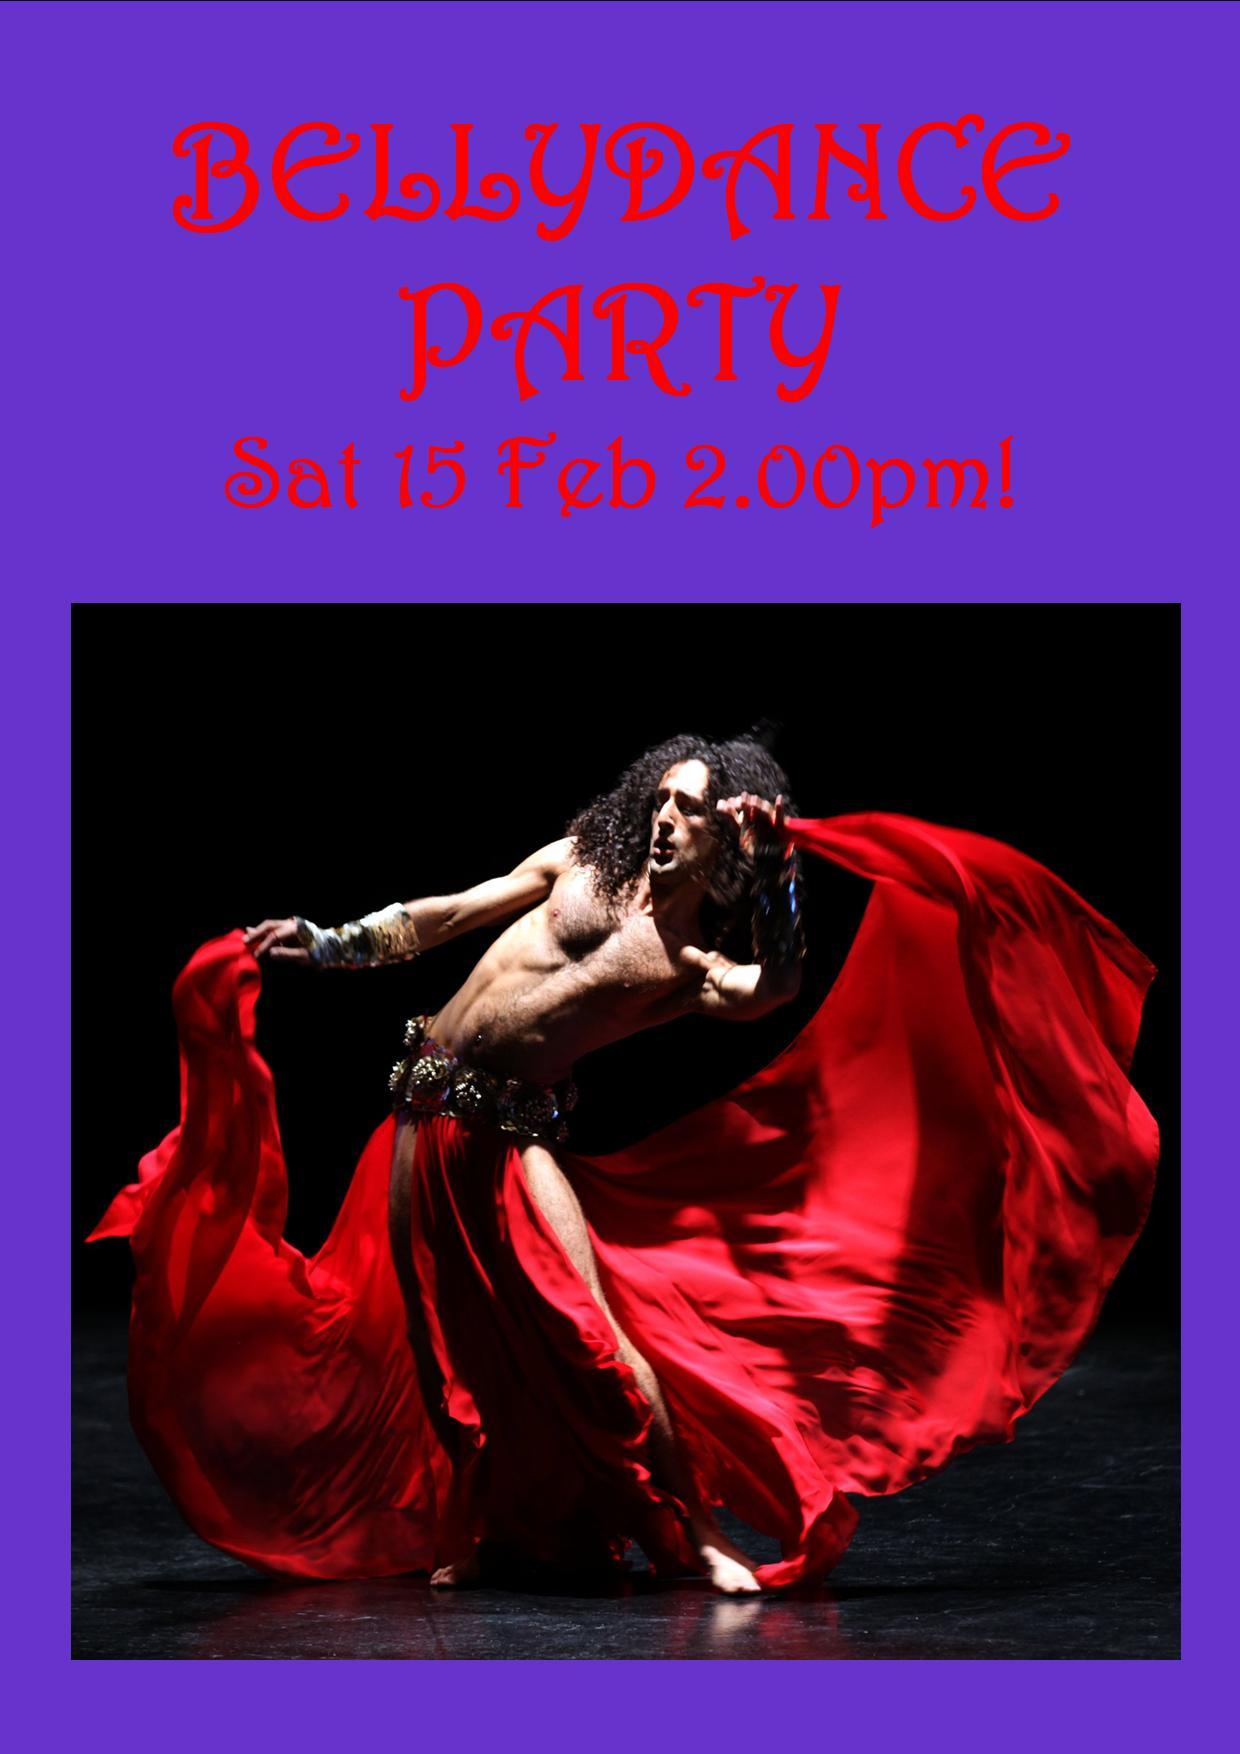 BELLYDANCE PARTY POSTER SAT 15 FEB 2.00PM!